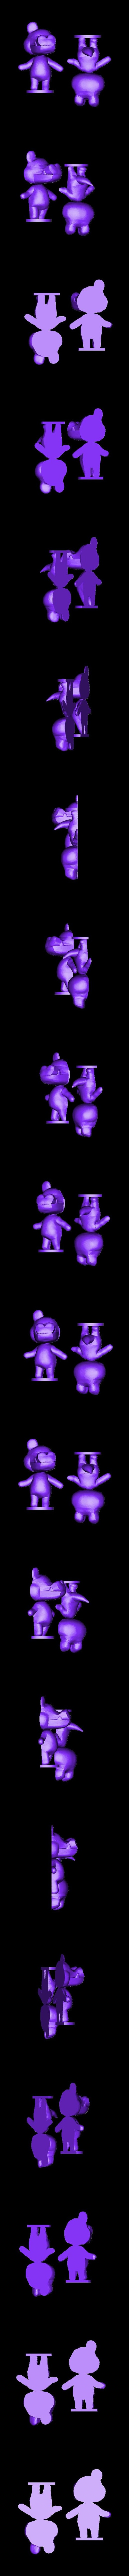 alli2 split.stl Download free STL file Alligator from Animal Crossing • 3D printable template, skelei